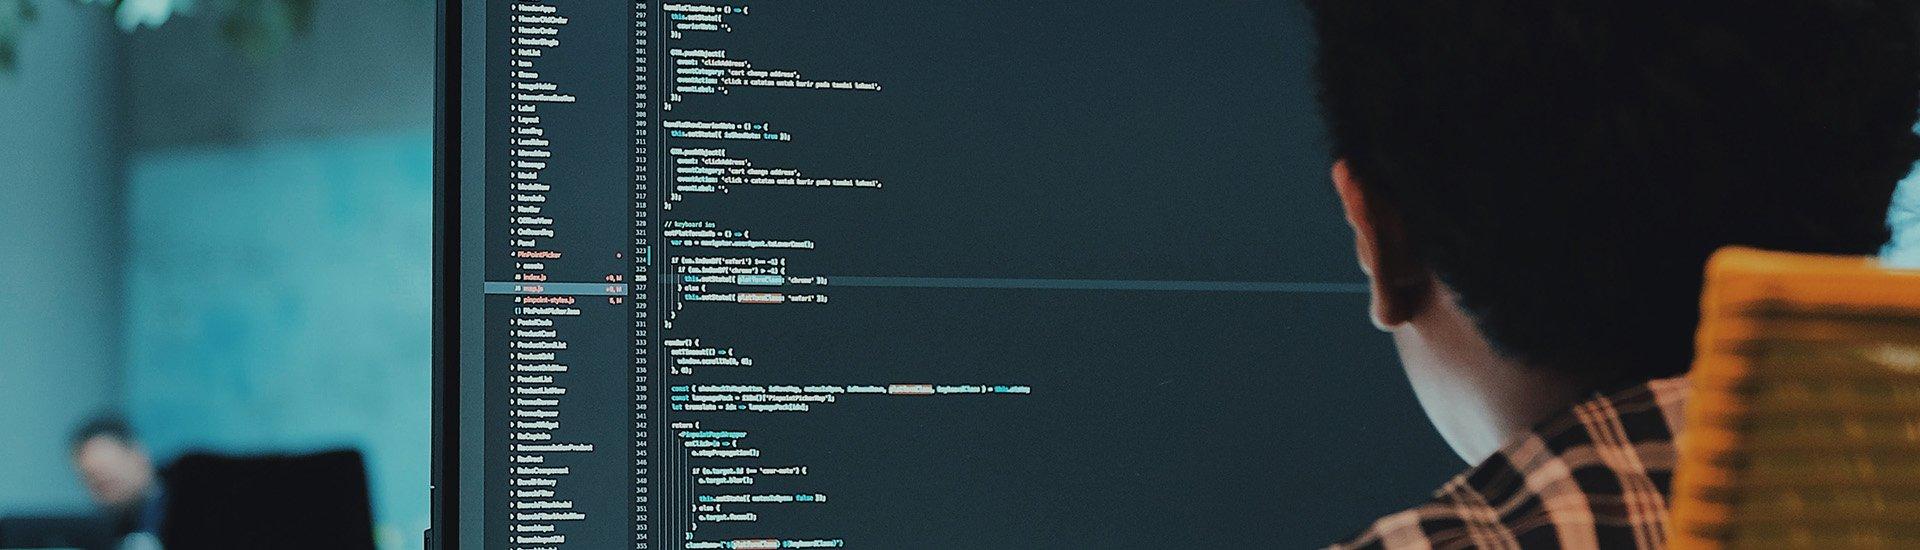 data-coding-on-screen-code